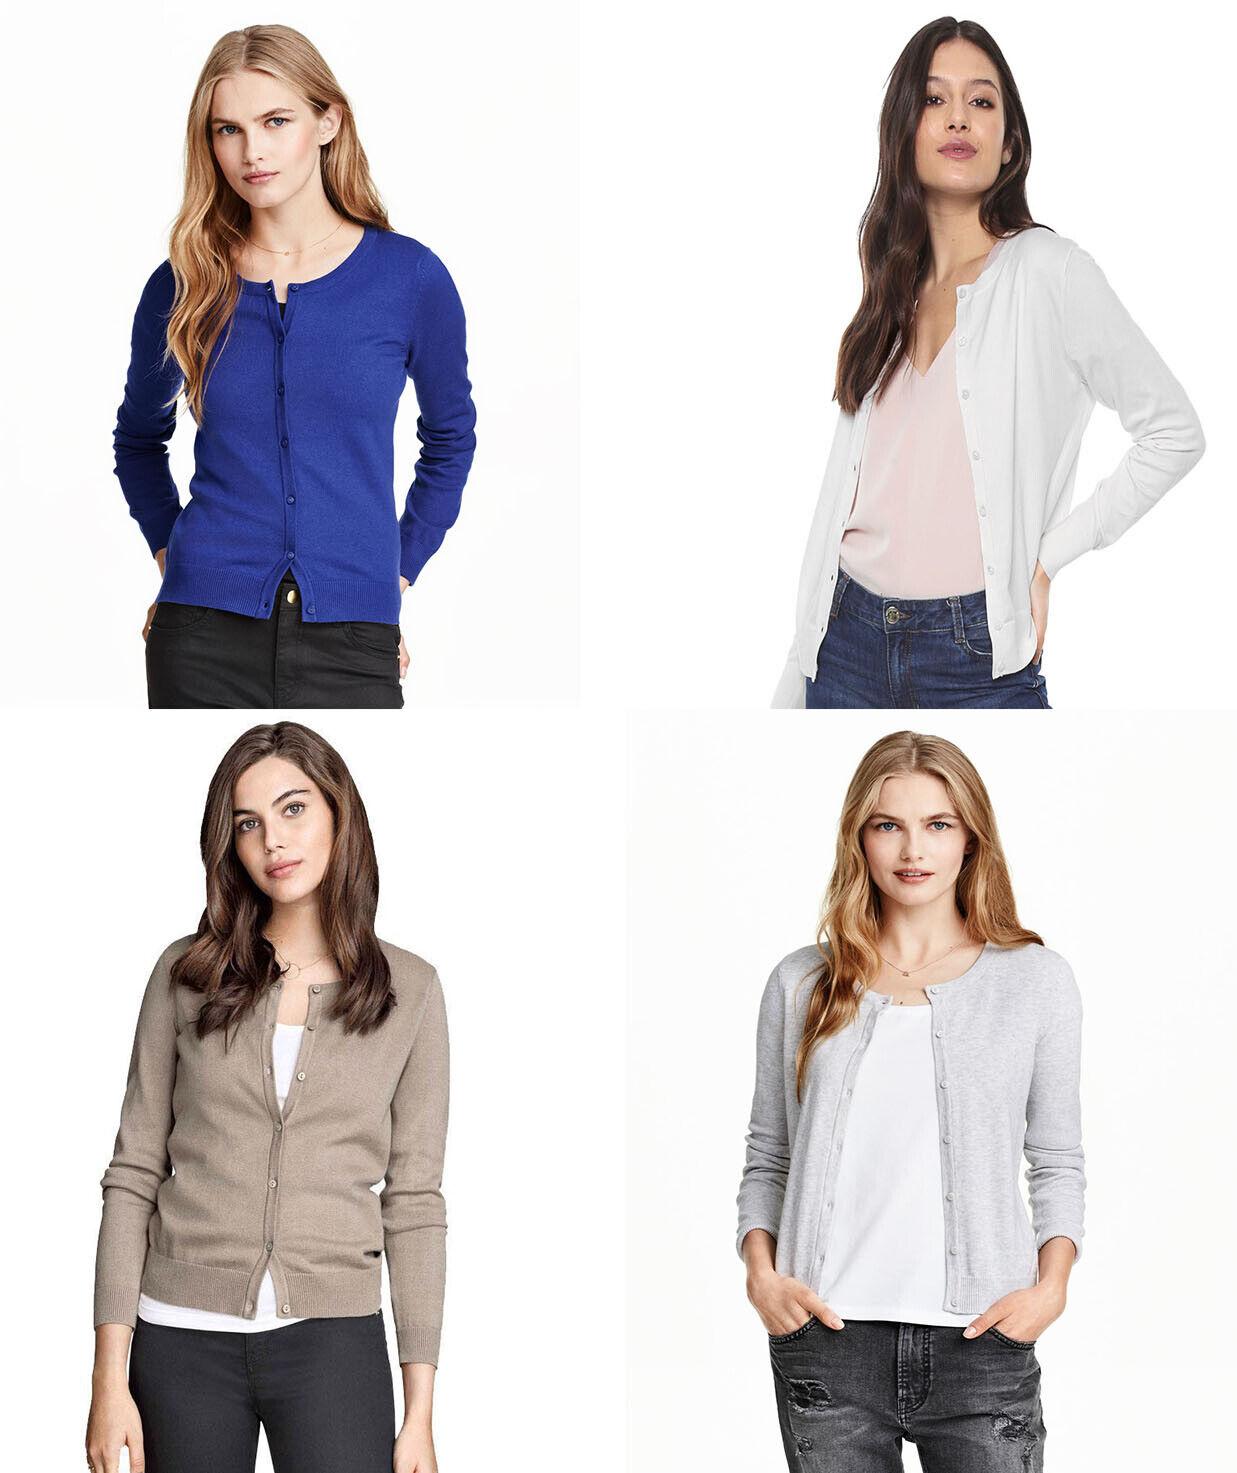 H&M Cotton Soft Knit ROUND NECK button Jumper Sweater Cardig